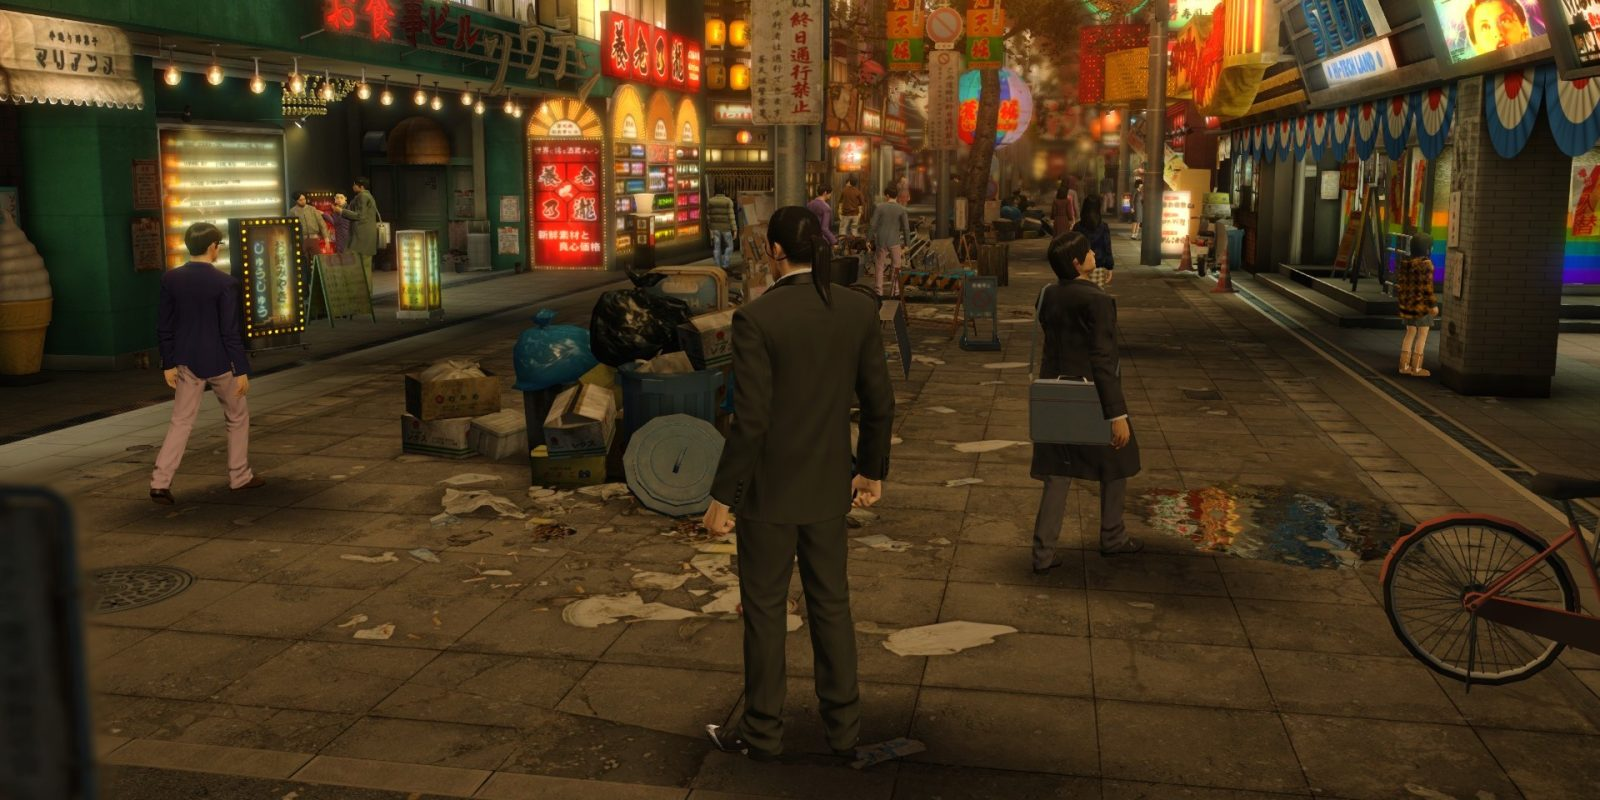 Today's Best Game Deals: Yakuza 0 $13.50, AC Origins + Odyssey $30, more